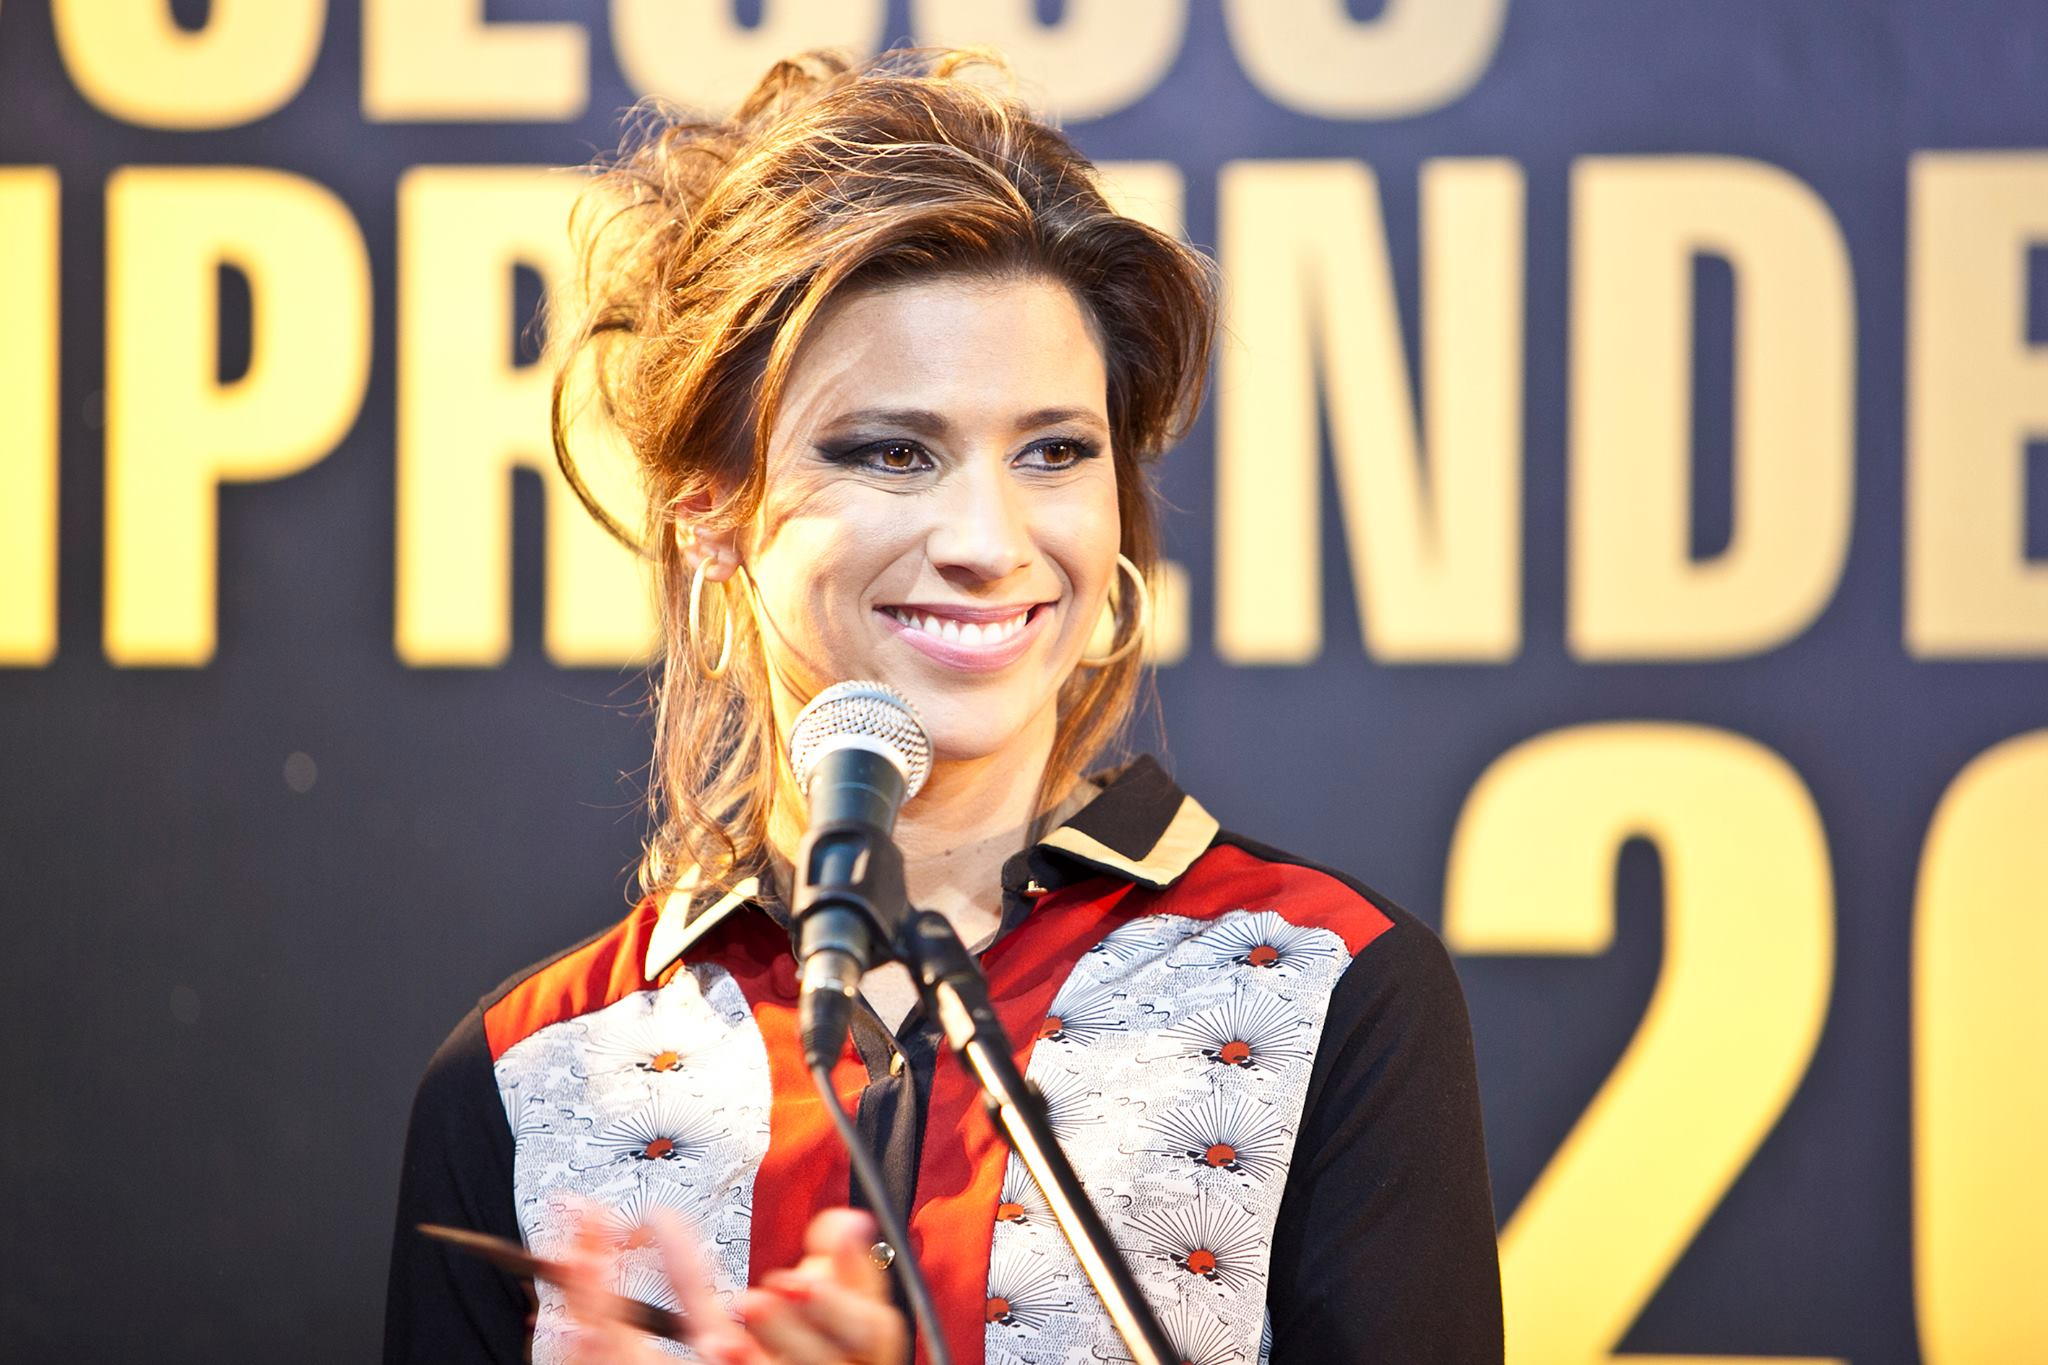 Camille Reis apresentará o Bella Lisboa em Floripa